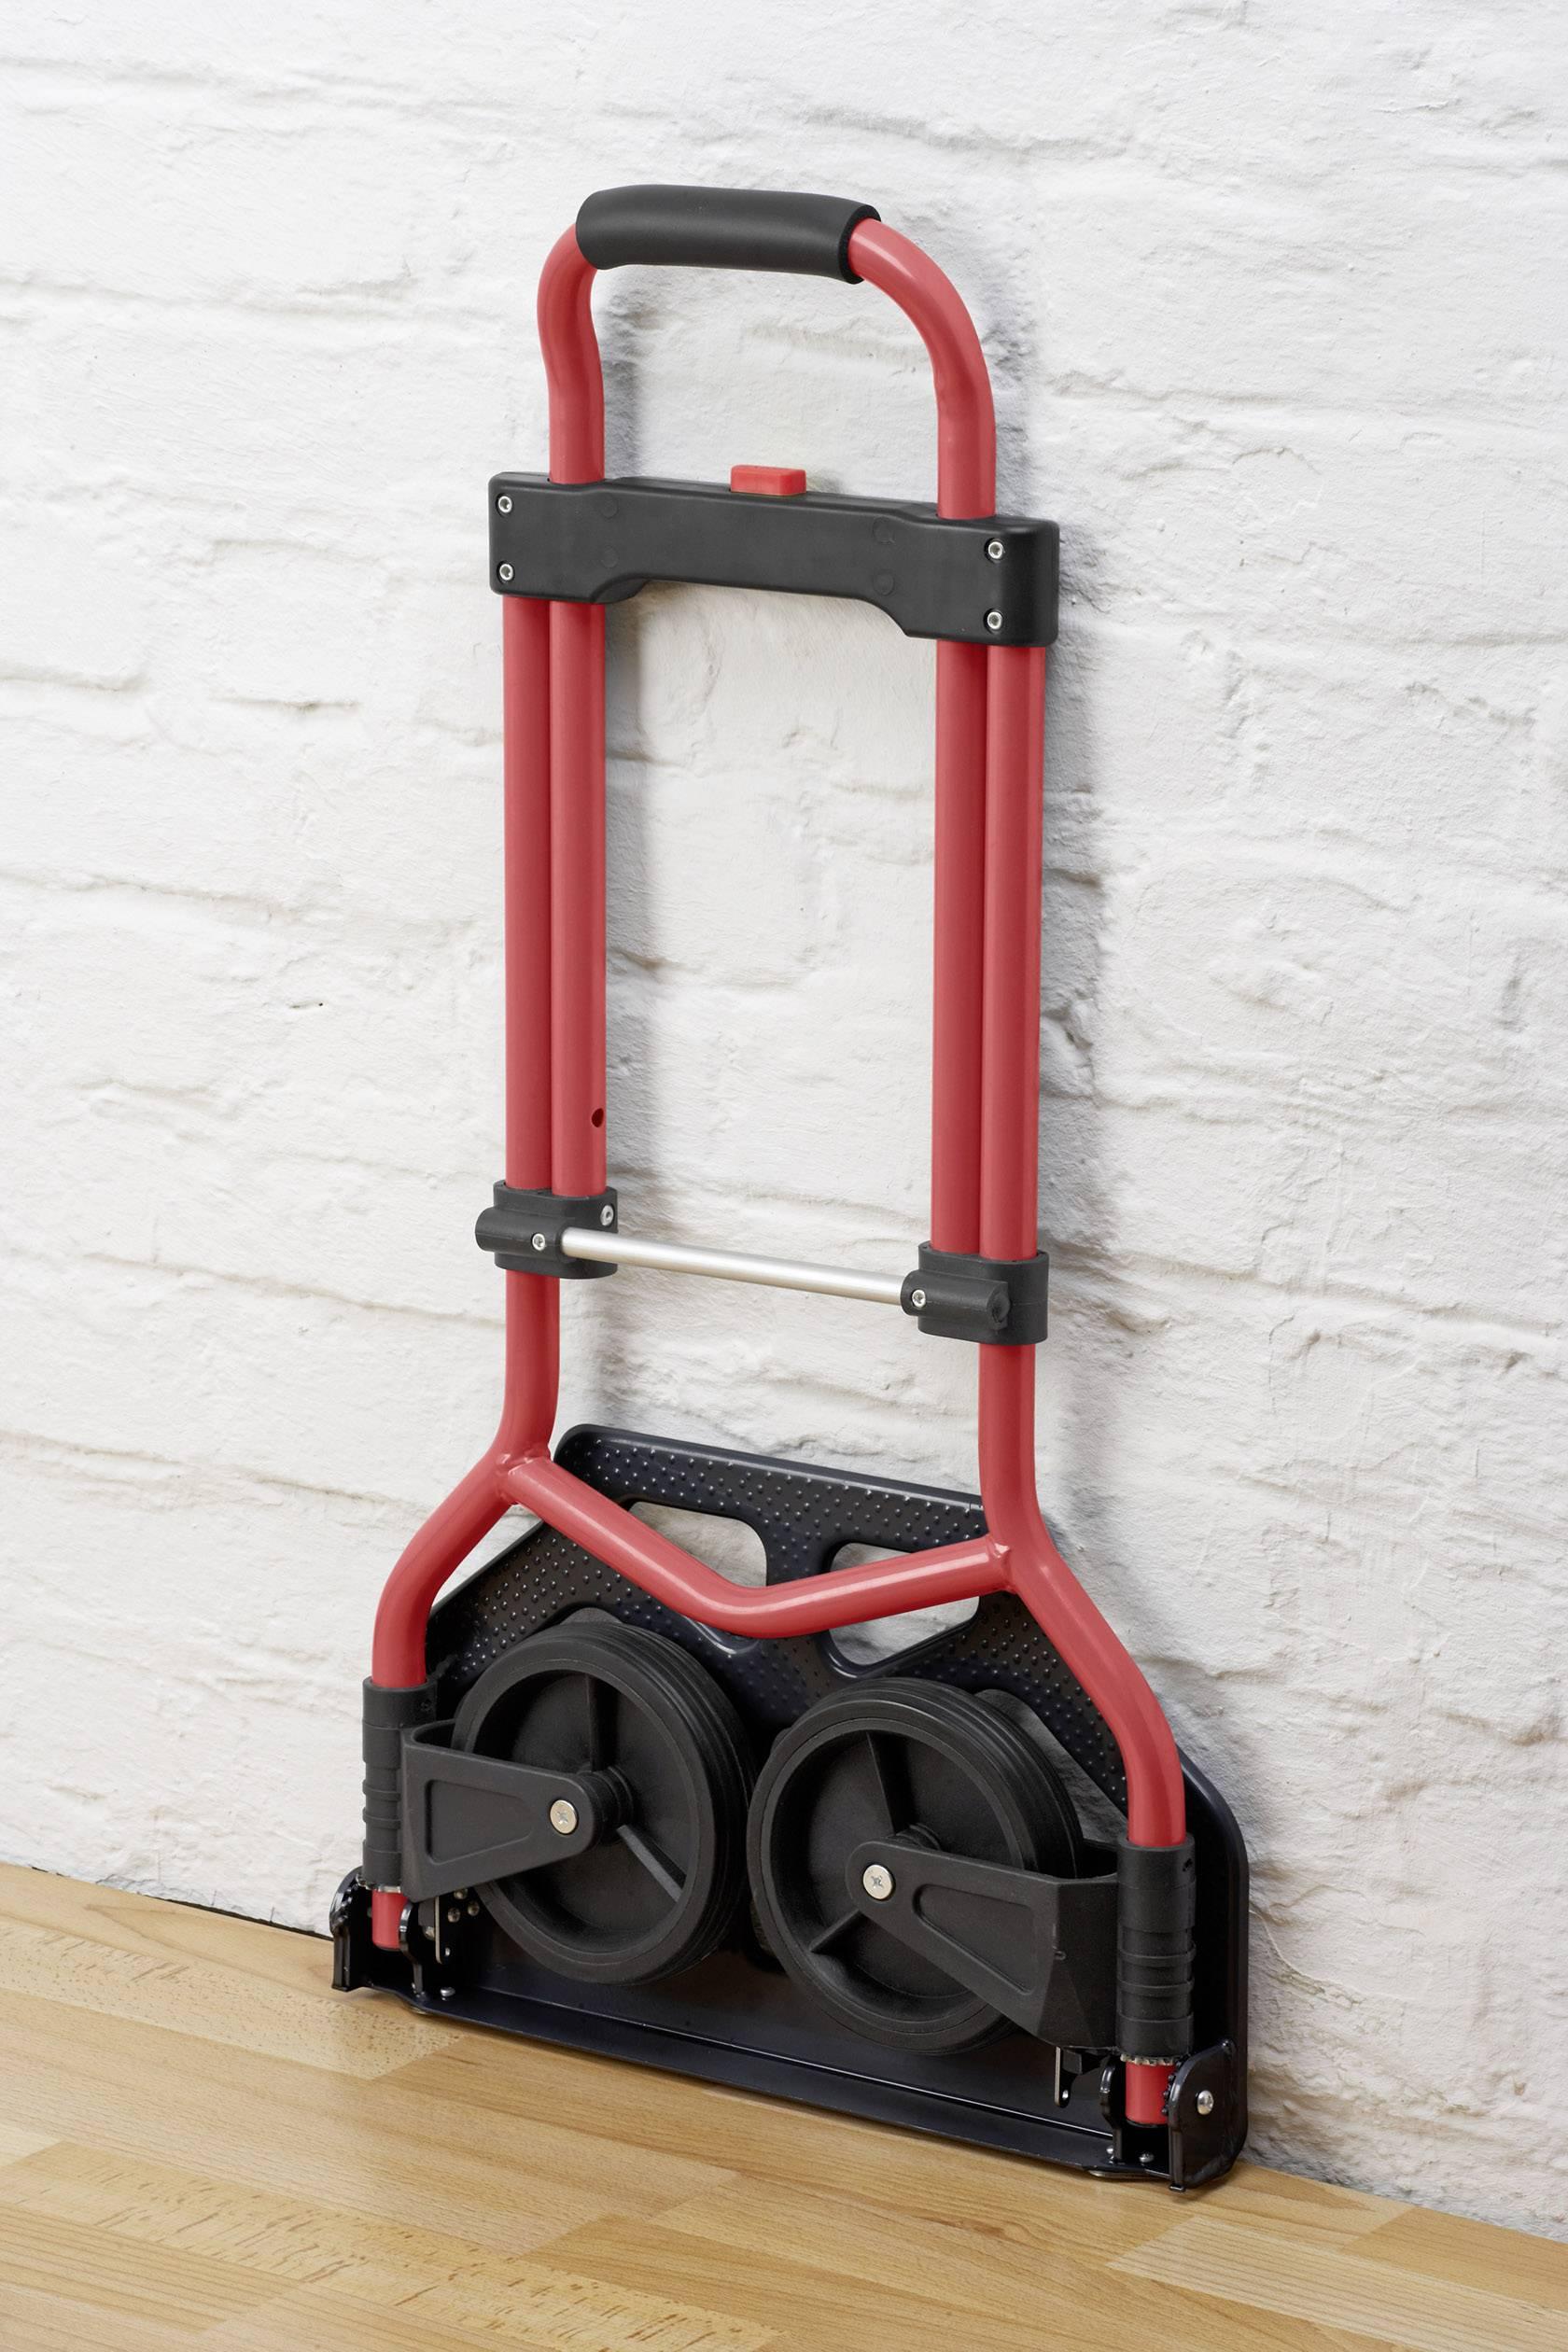 Skládací rudl, nosnost 60 kg